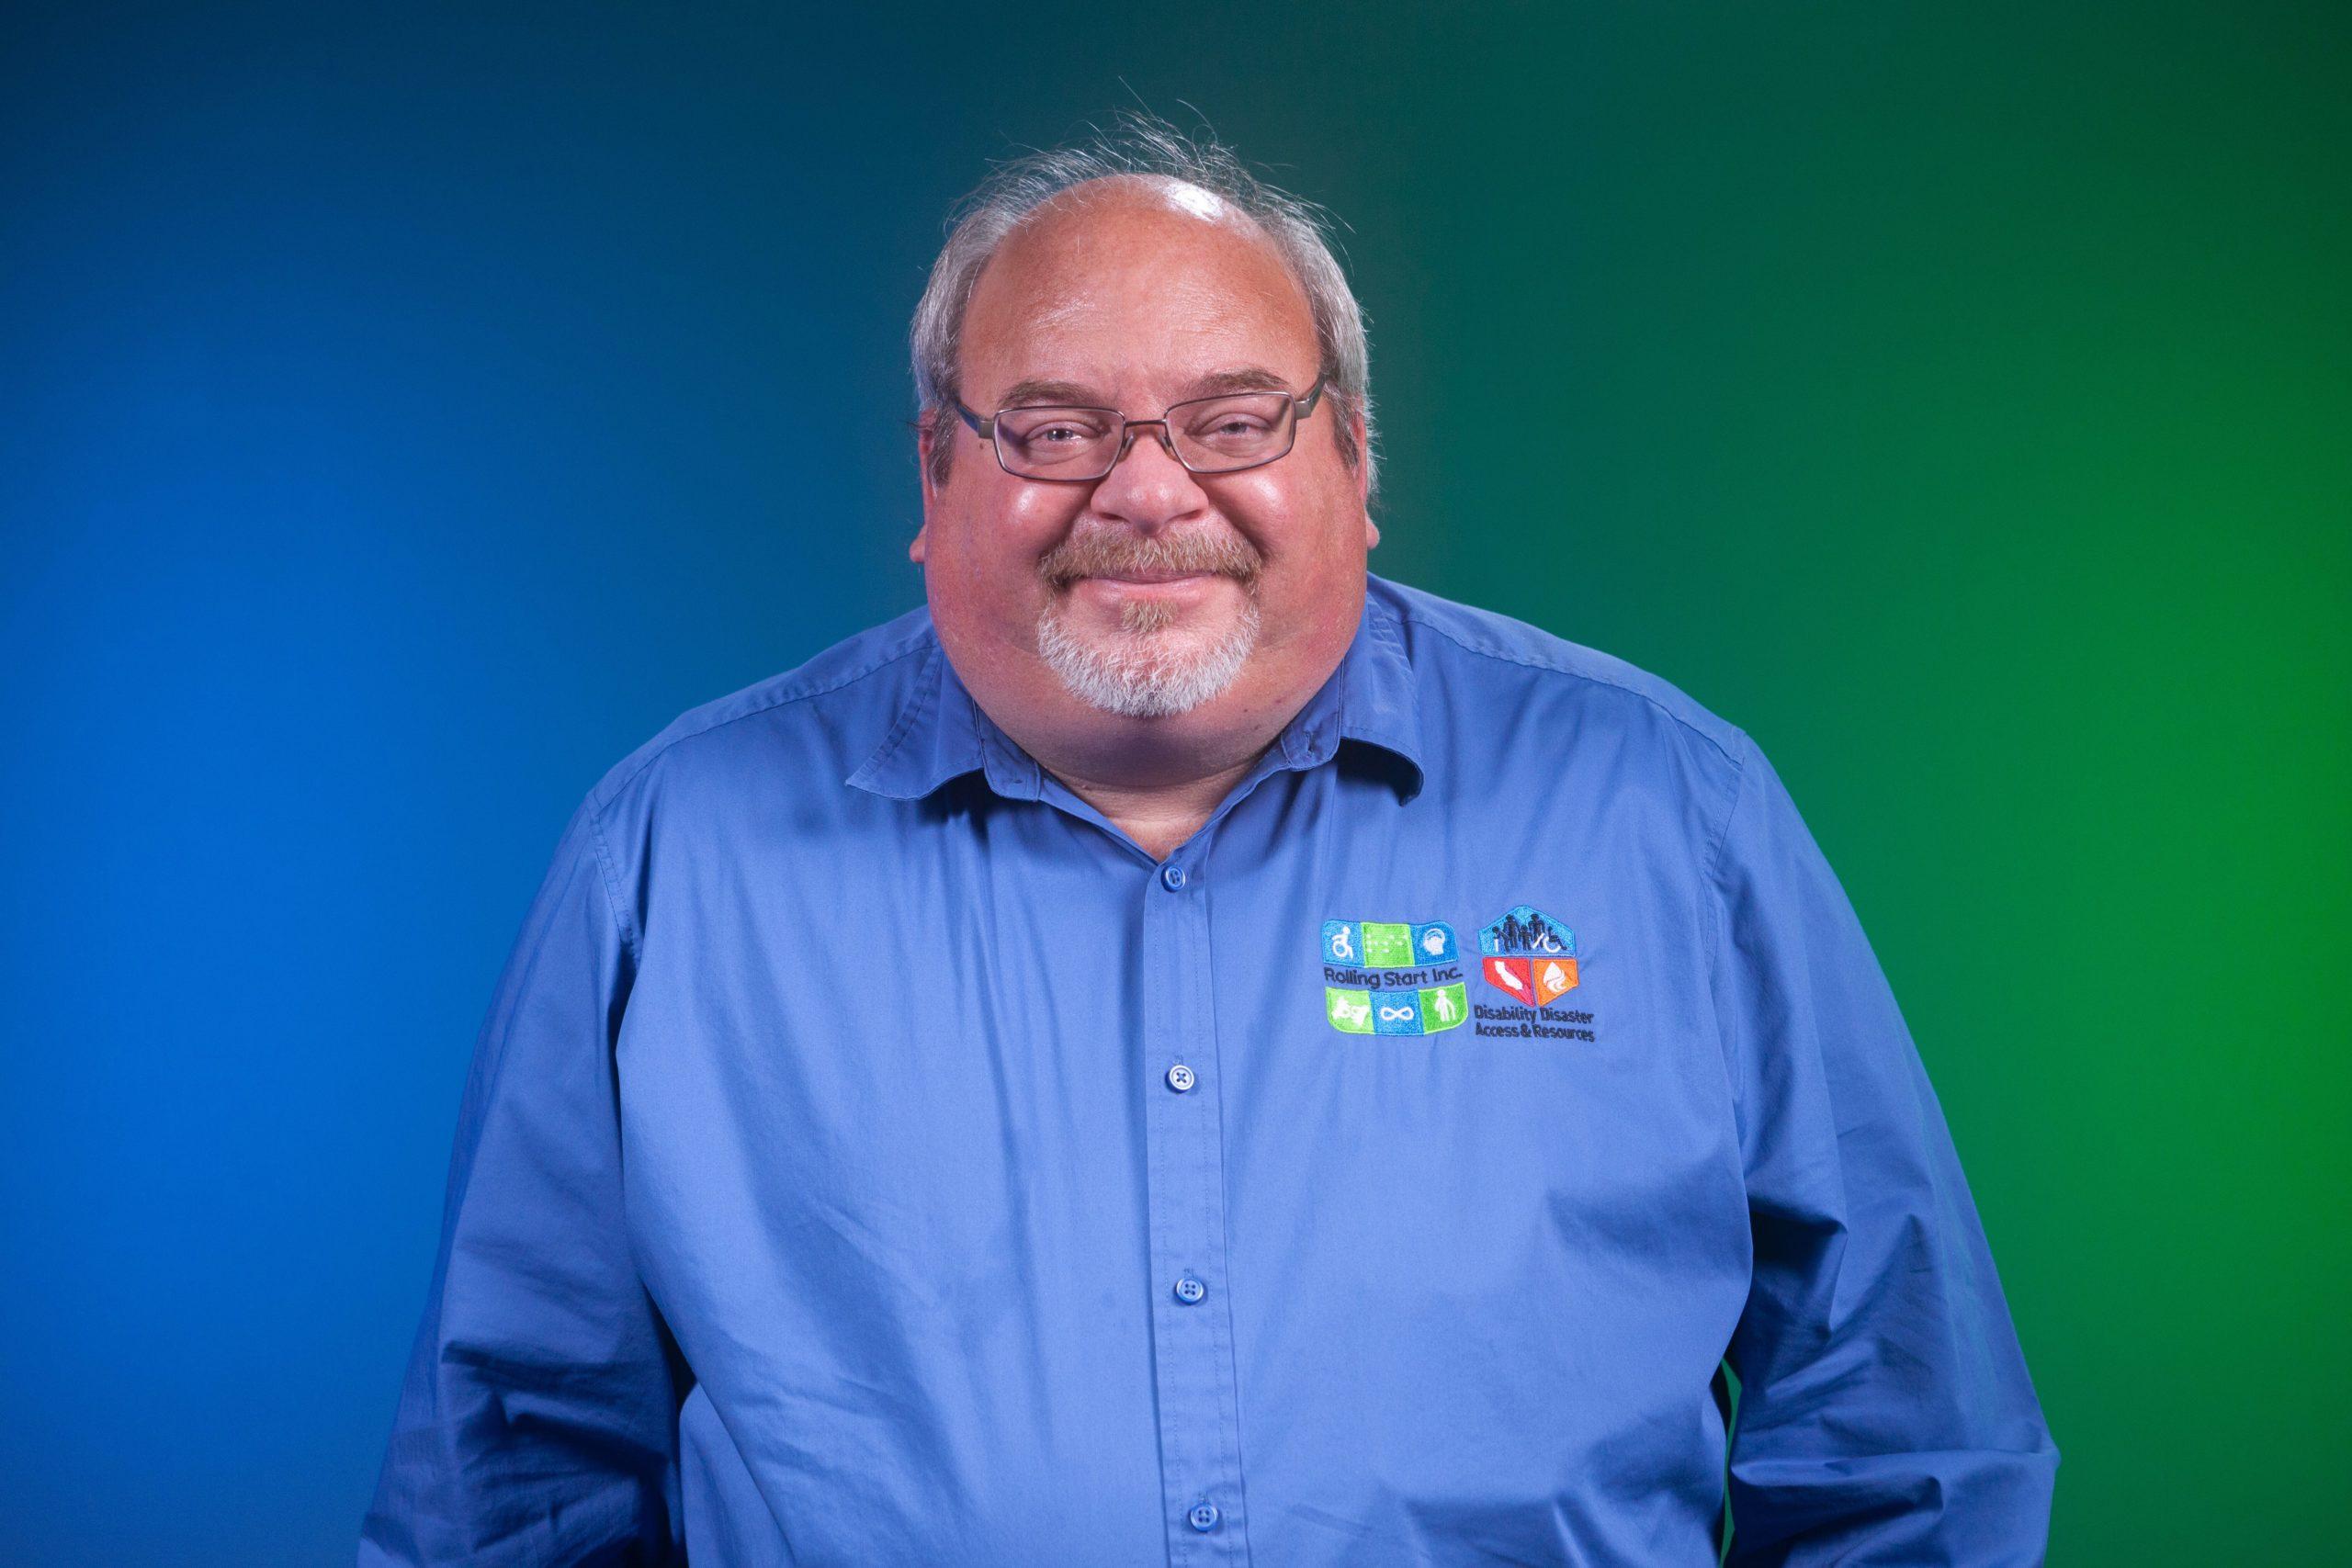 Bruce Morgan - Emergency Management/PSPS Coordinator